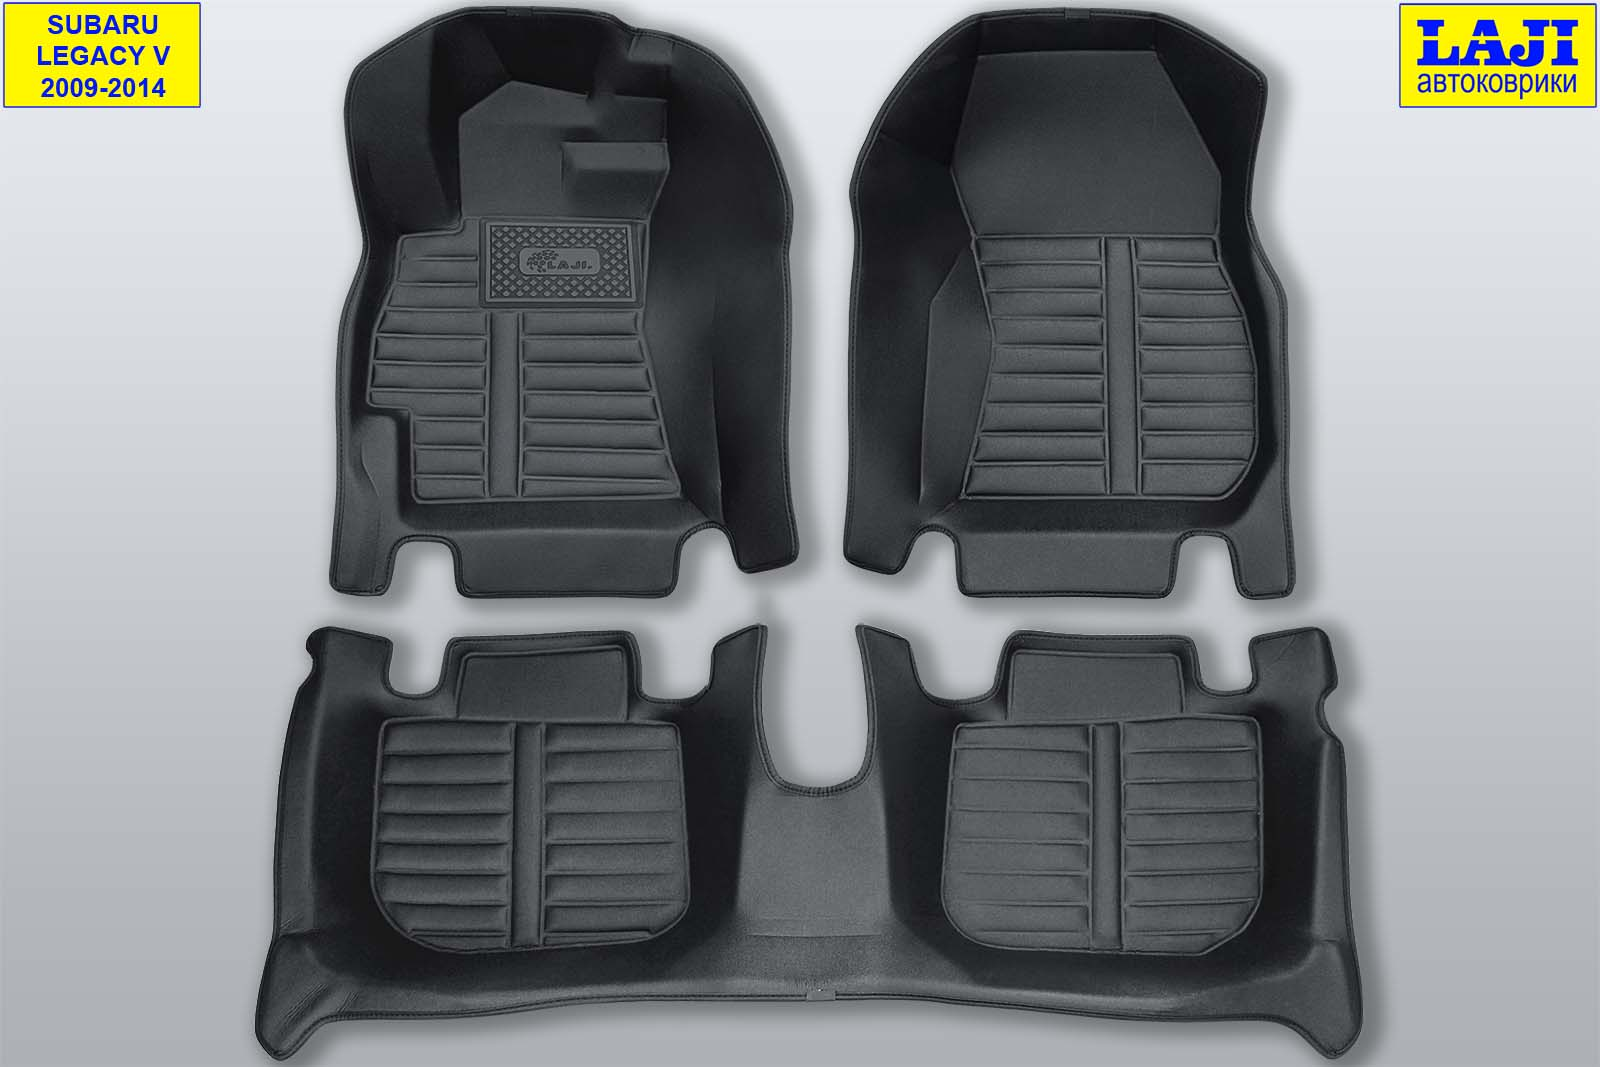 5D коврики в салон Subaru Legacy 5 2009-2014 1